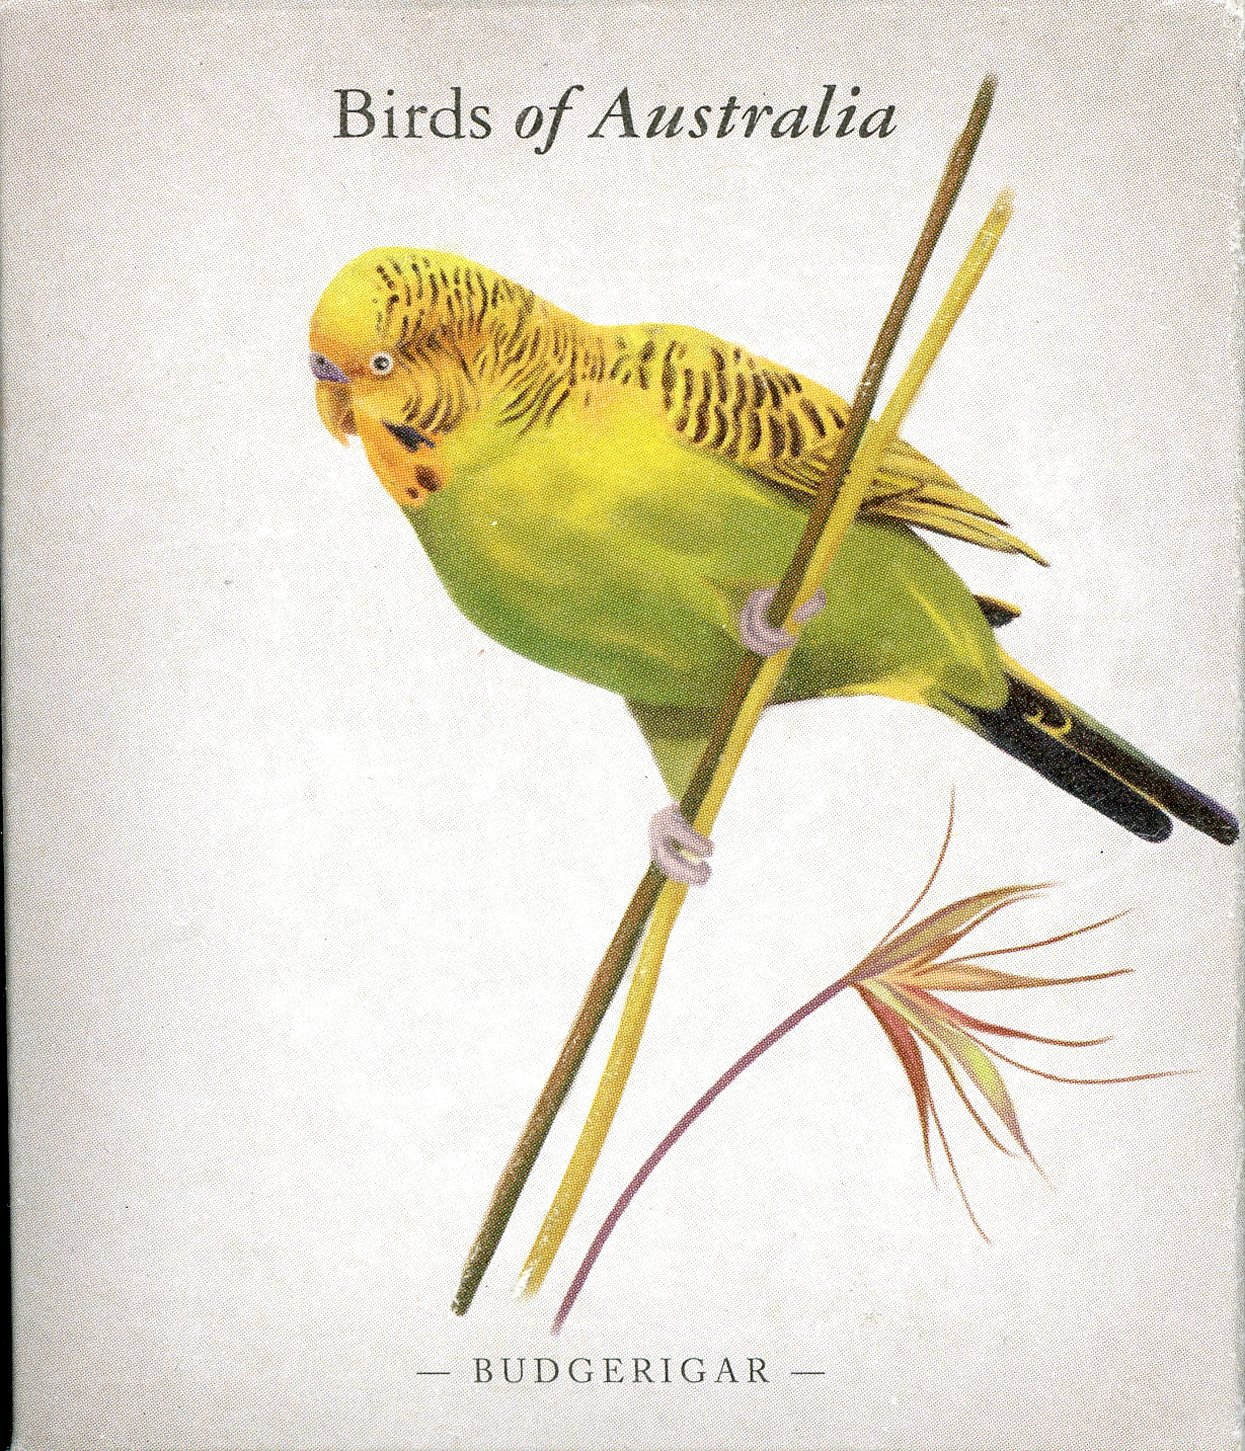 Thumbnail for 2013 Australian Half oz Coloured Silver Proof Birds of Australia - Budgerigar